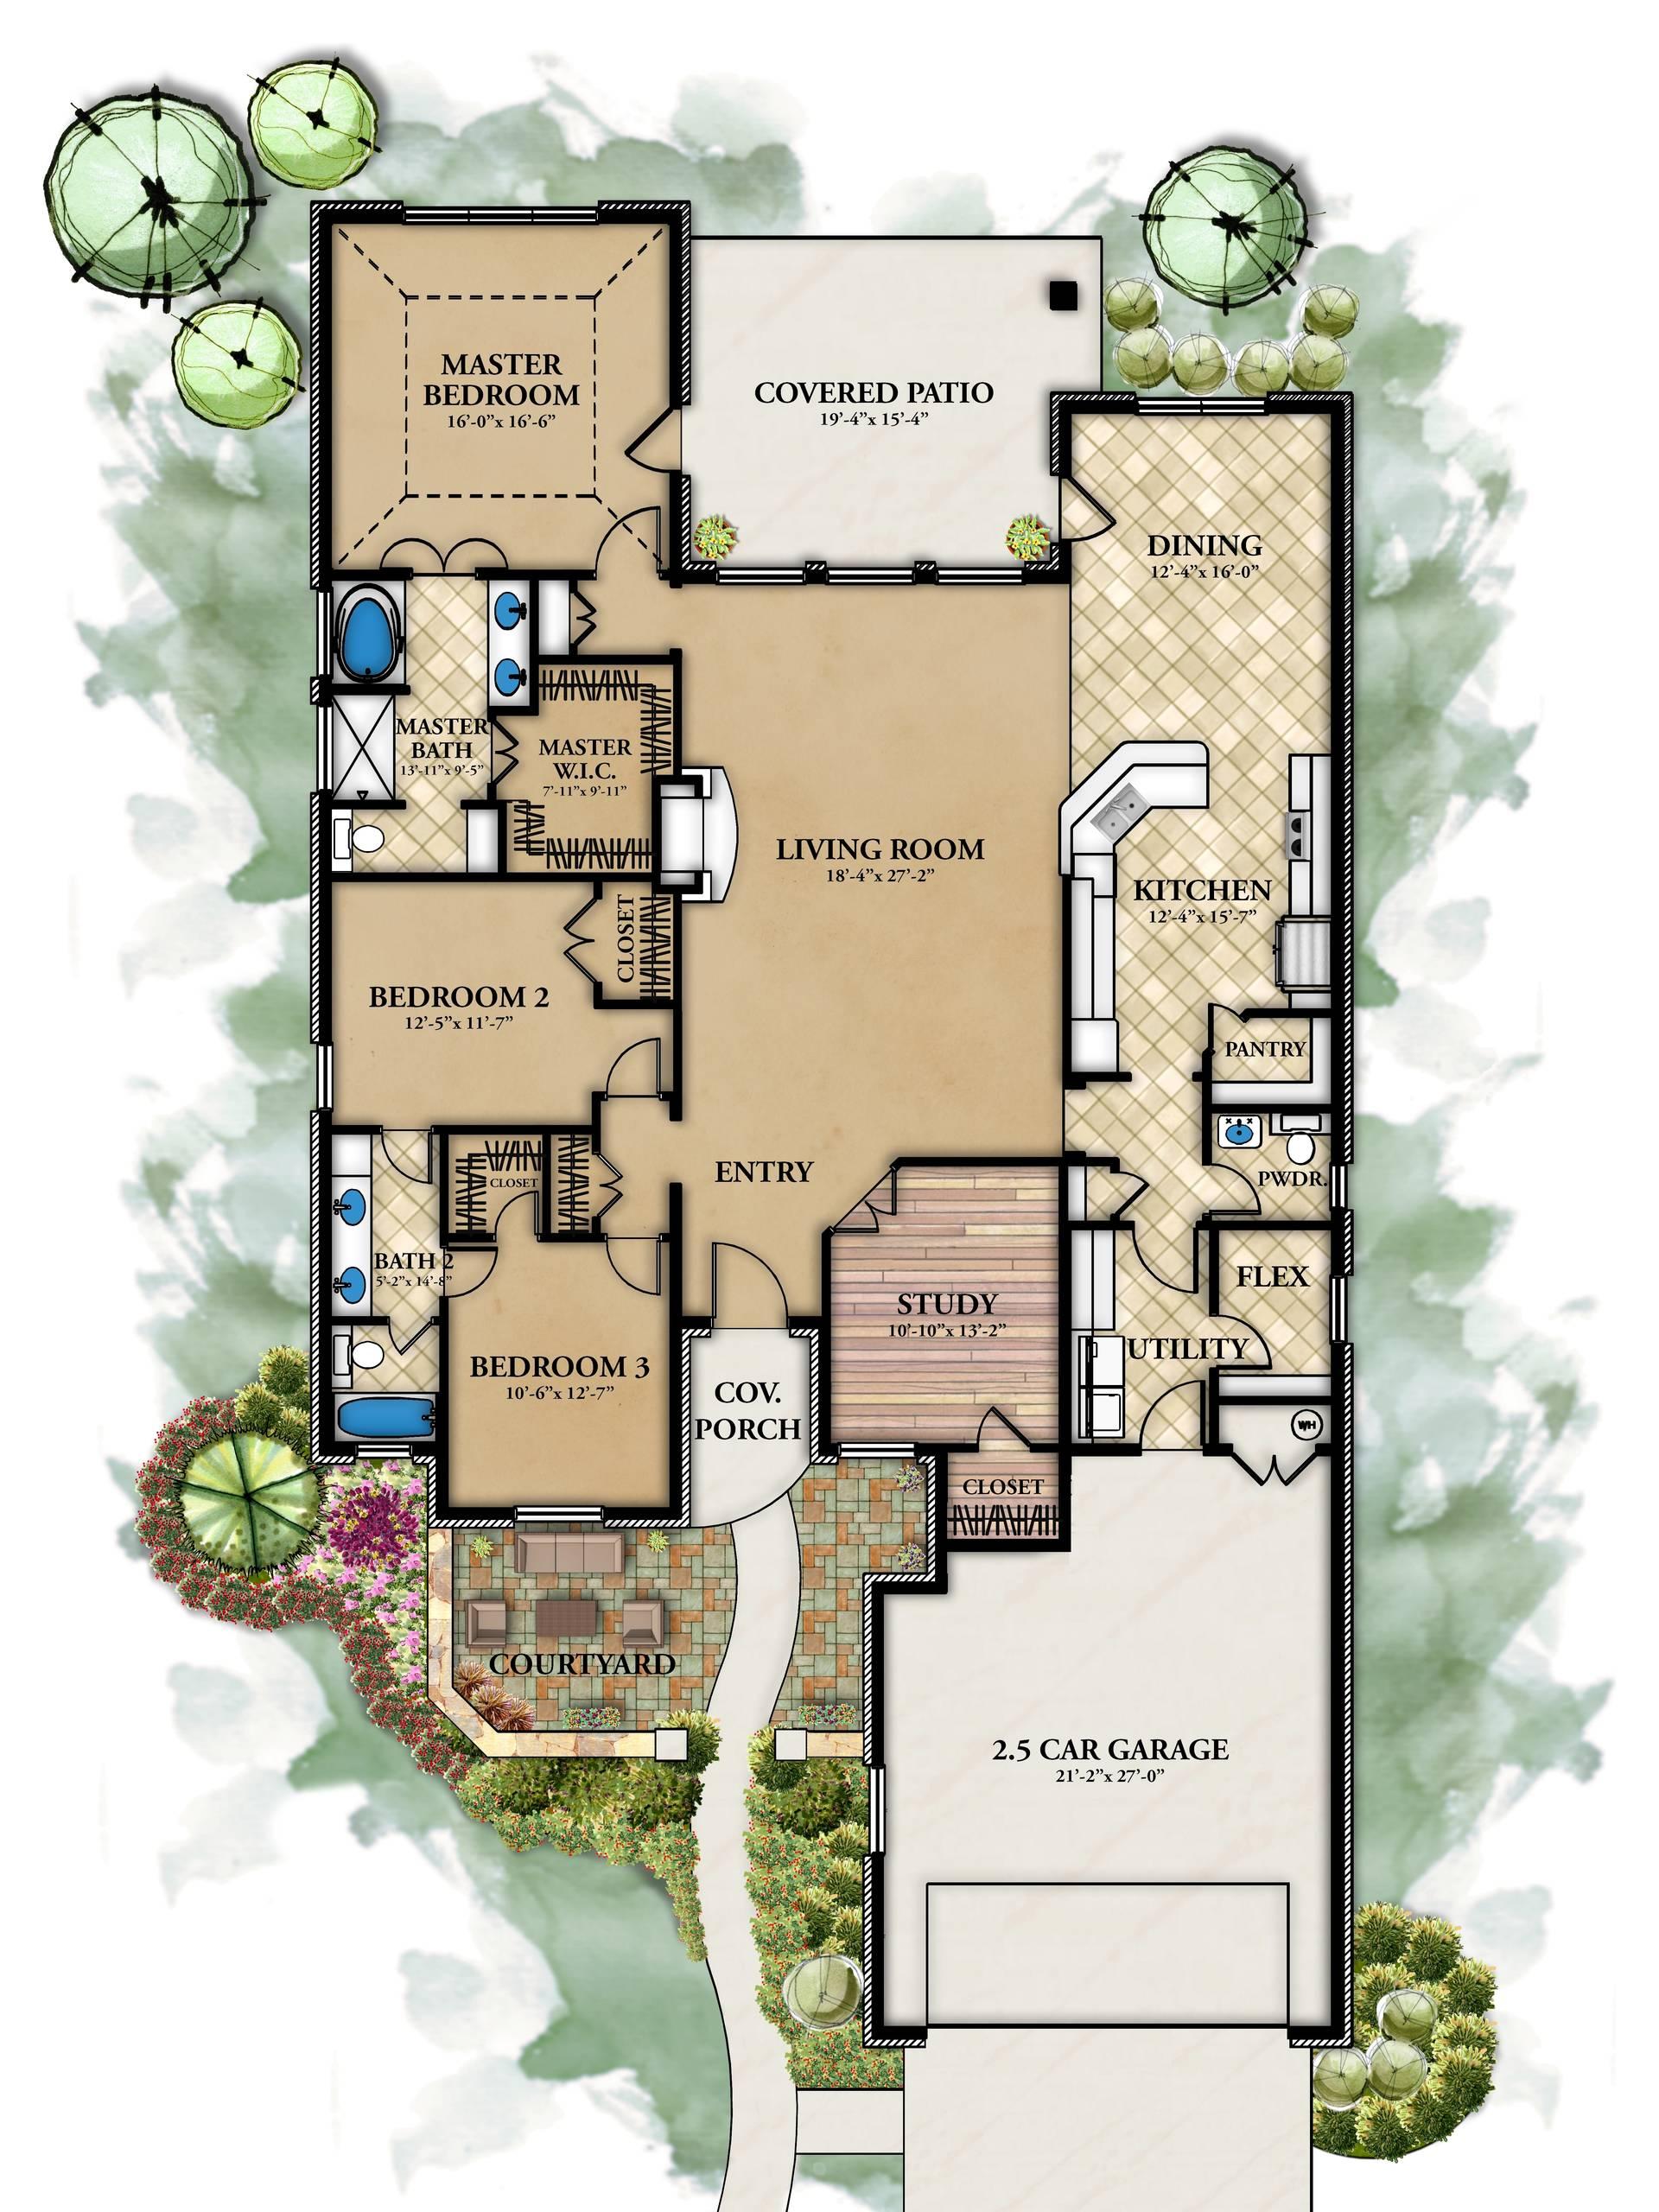 Seven Oaks (Plan 2510) - Edmond, OK